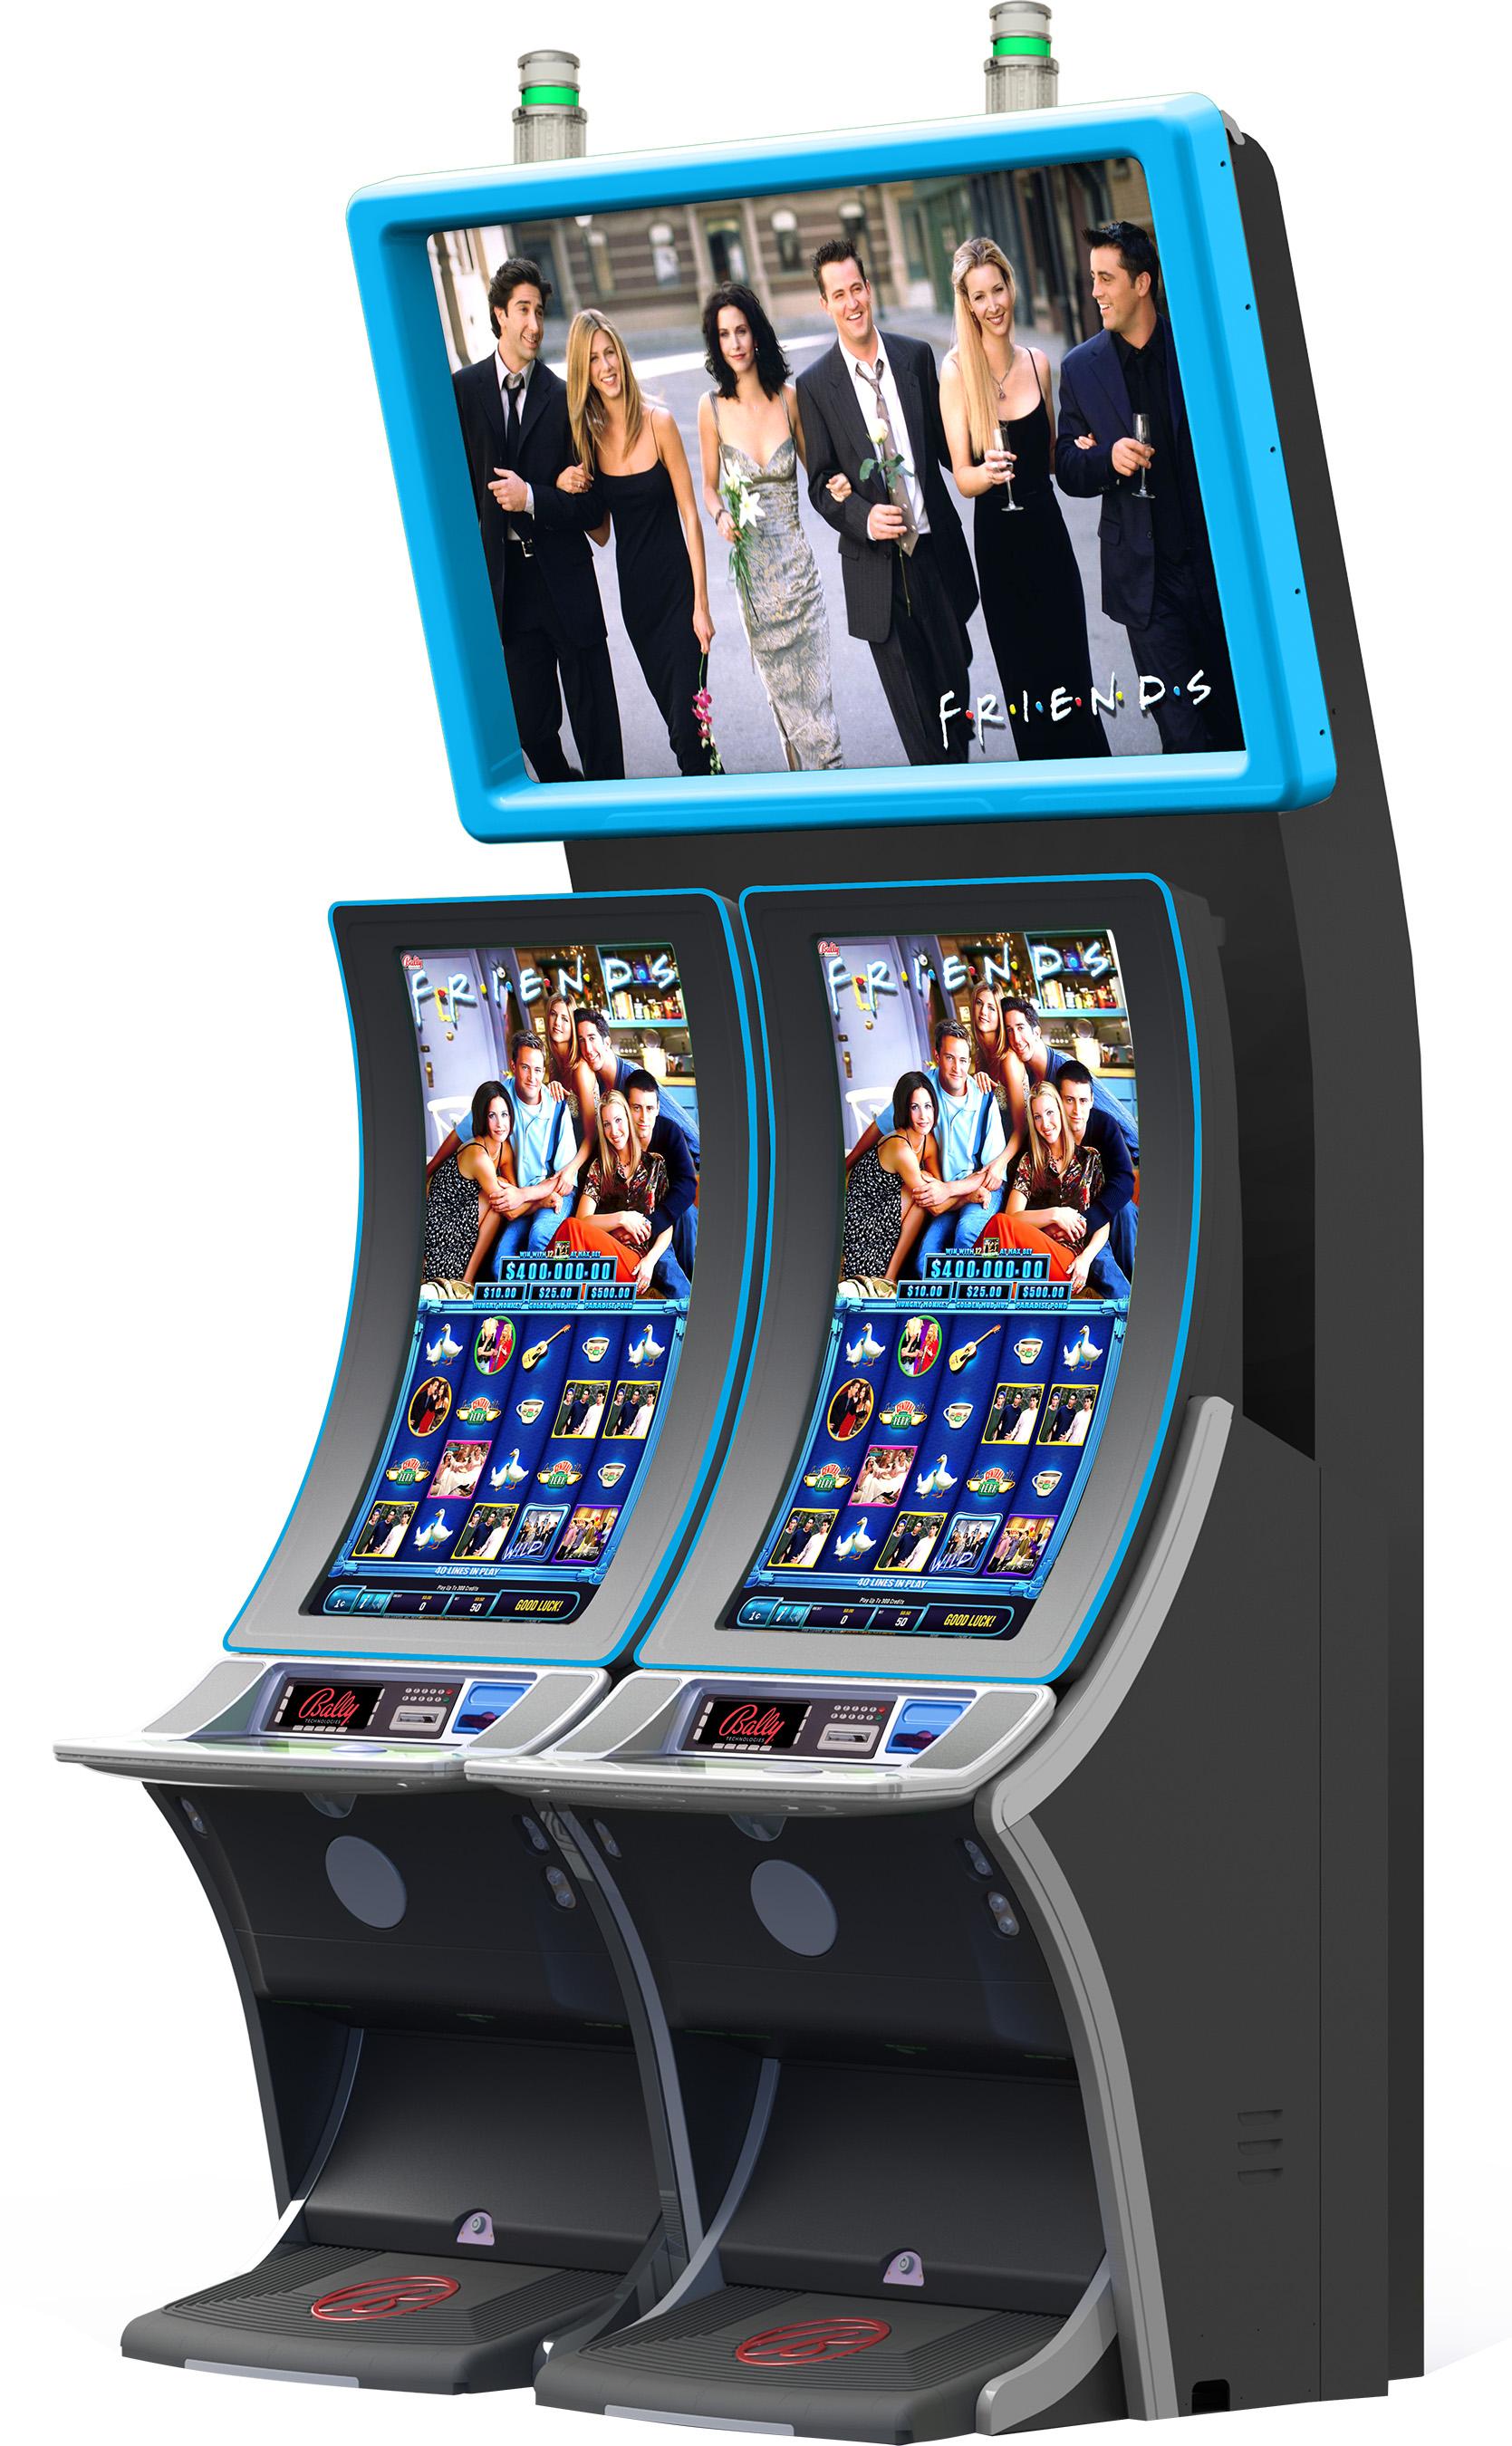 Slots garden mobile casino login